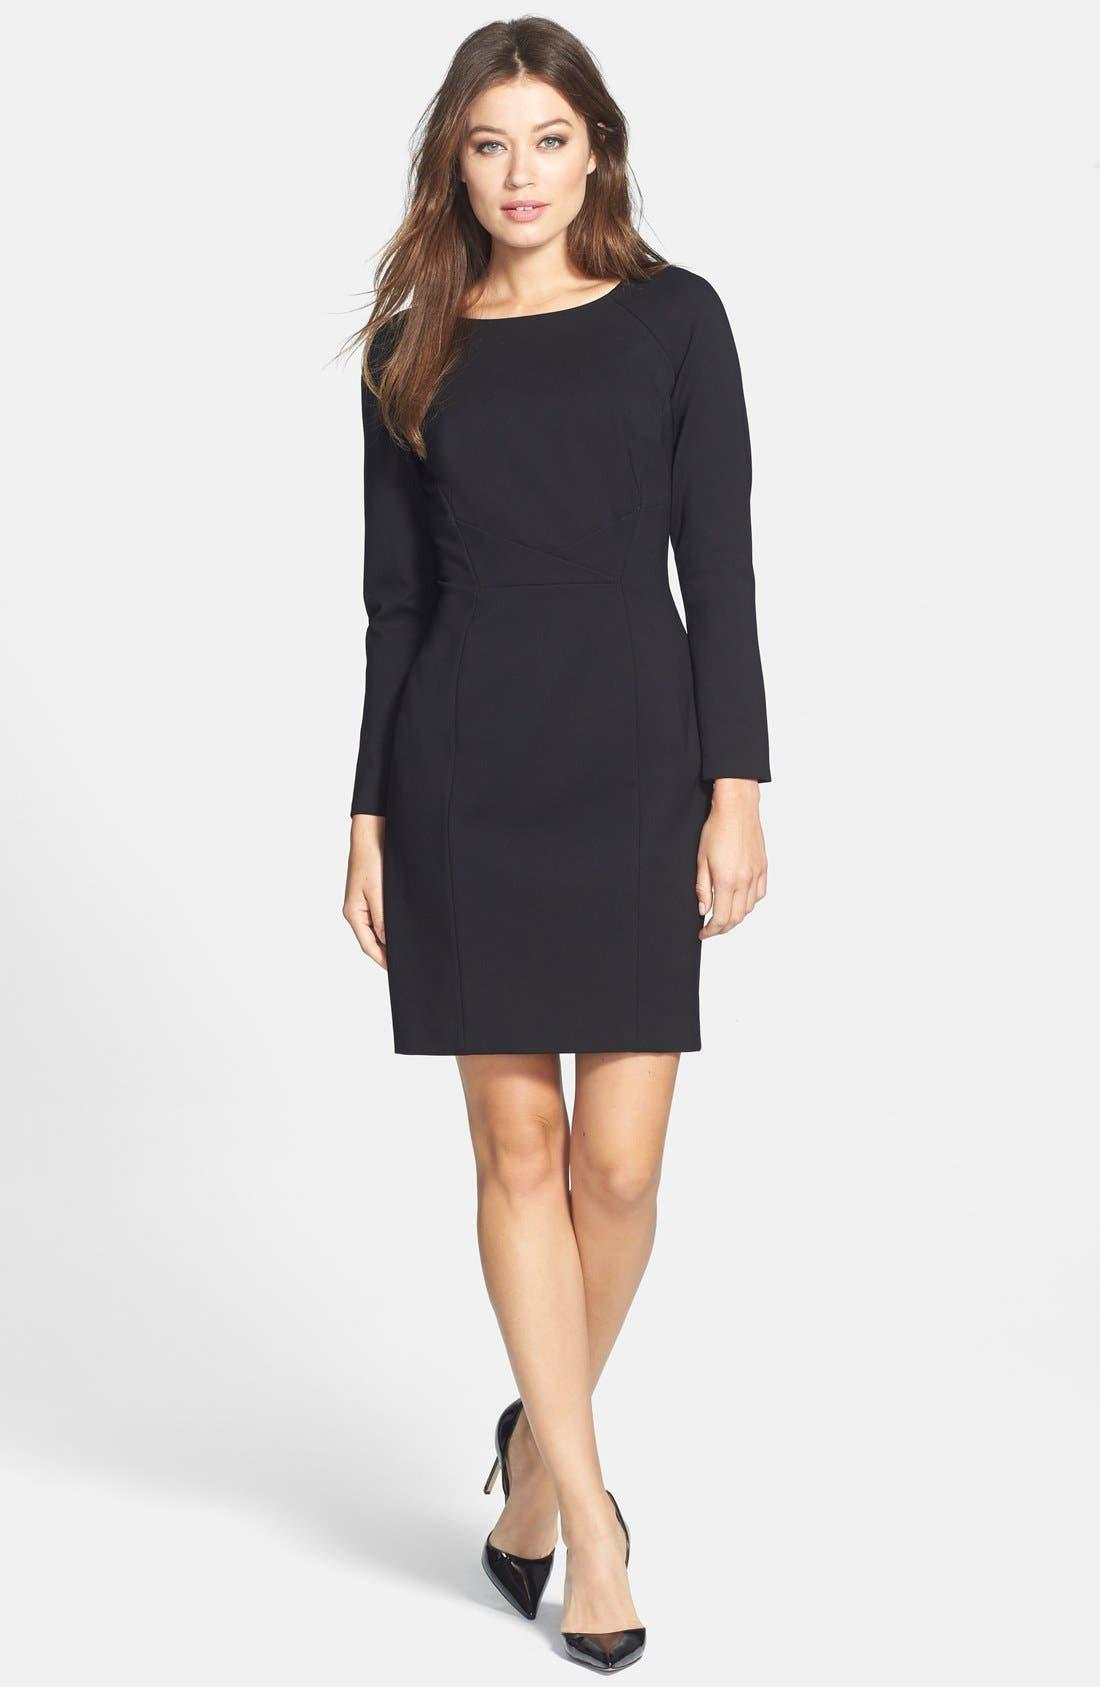 TAHARI, Pleat Detail Long Sleeve Ponte Sheath Dress, Alternate thumbnail 3, color, 001